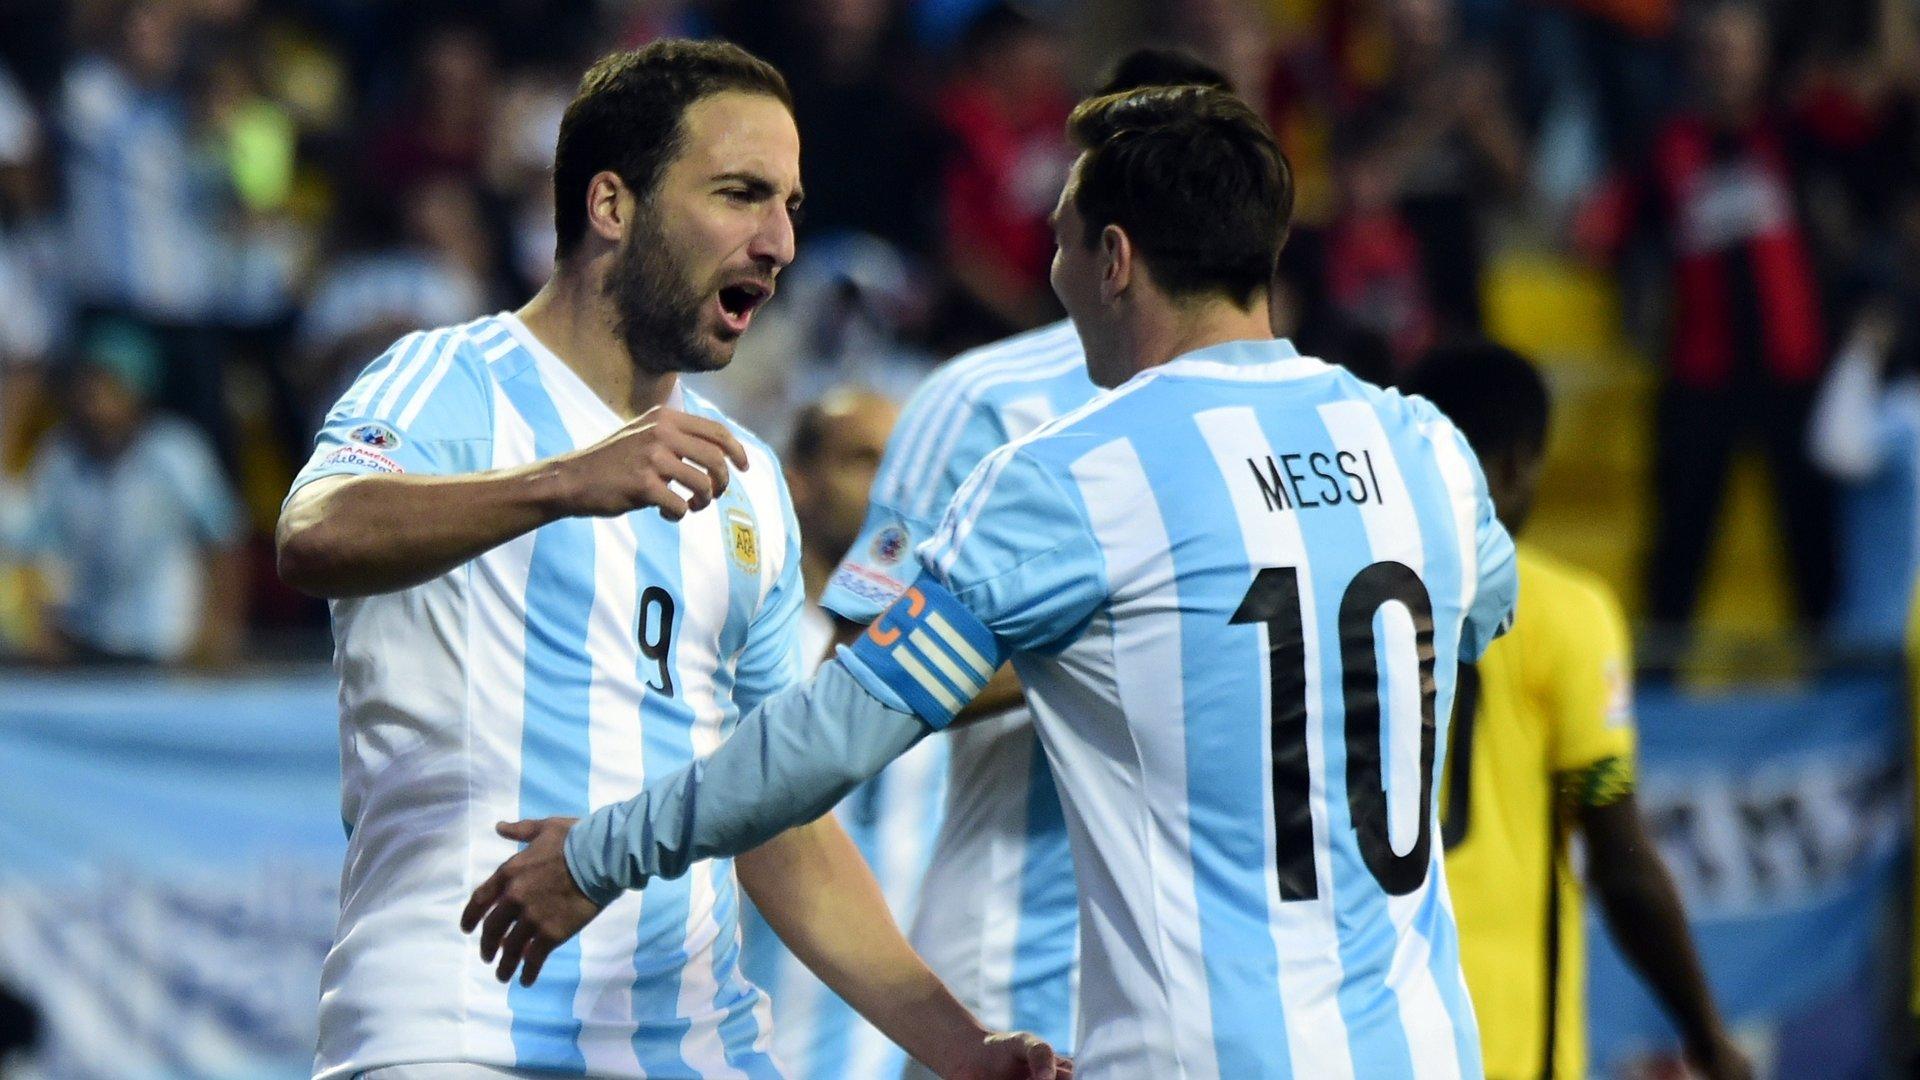 Gonzalo Higuain and Lionel Messi Argentina